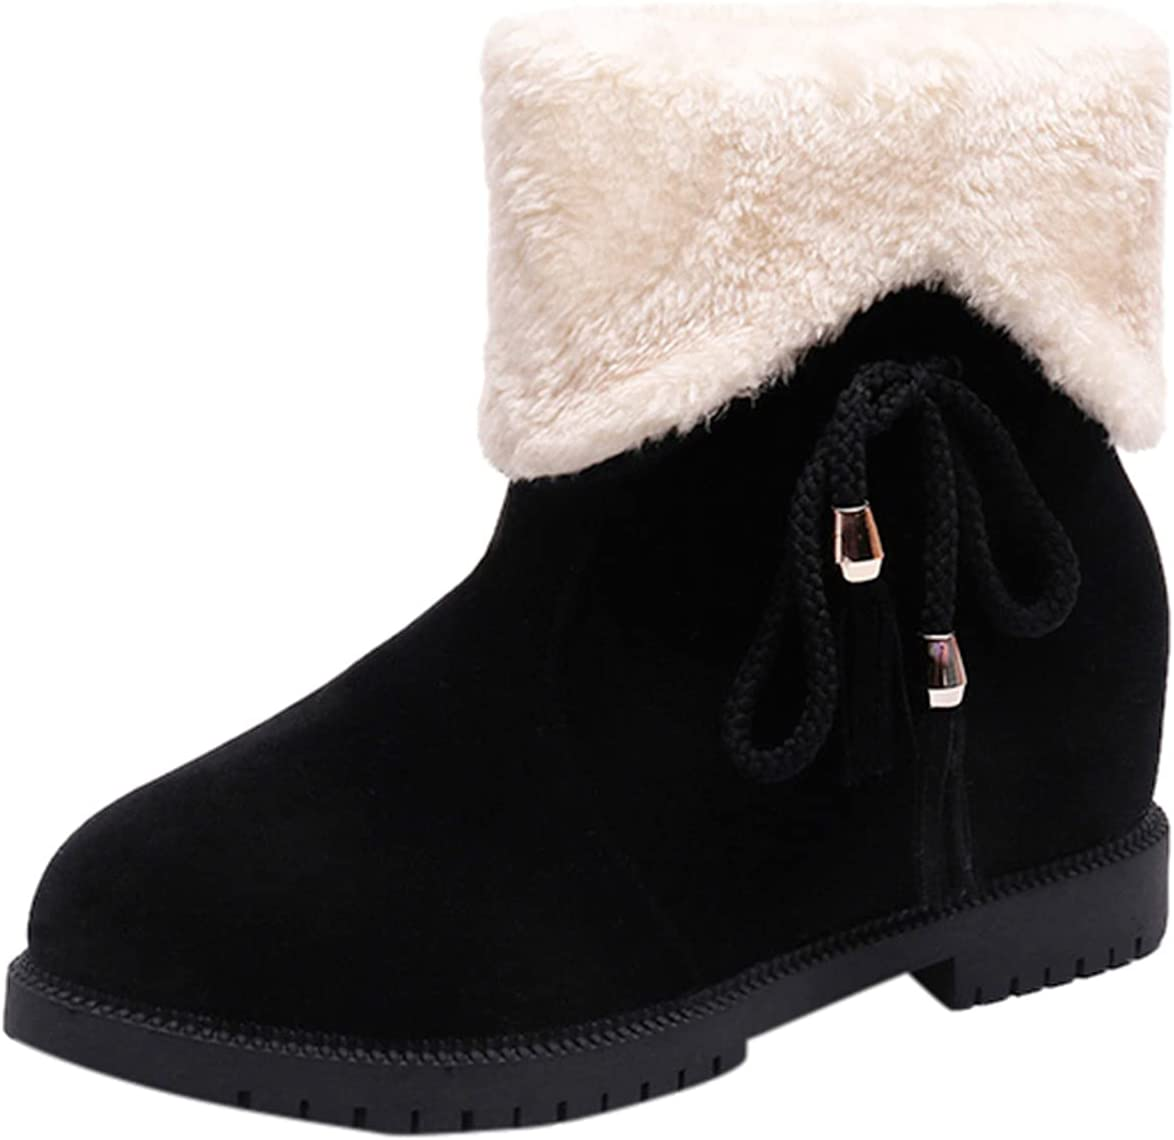 LODDD Women's Winter Warm Ankle Booties Tassel Bow Round Toe Low Heel Snow Boots Fuzzy Flat Short Boots